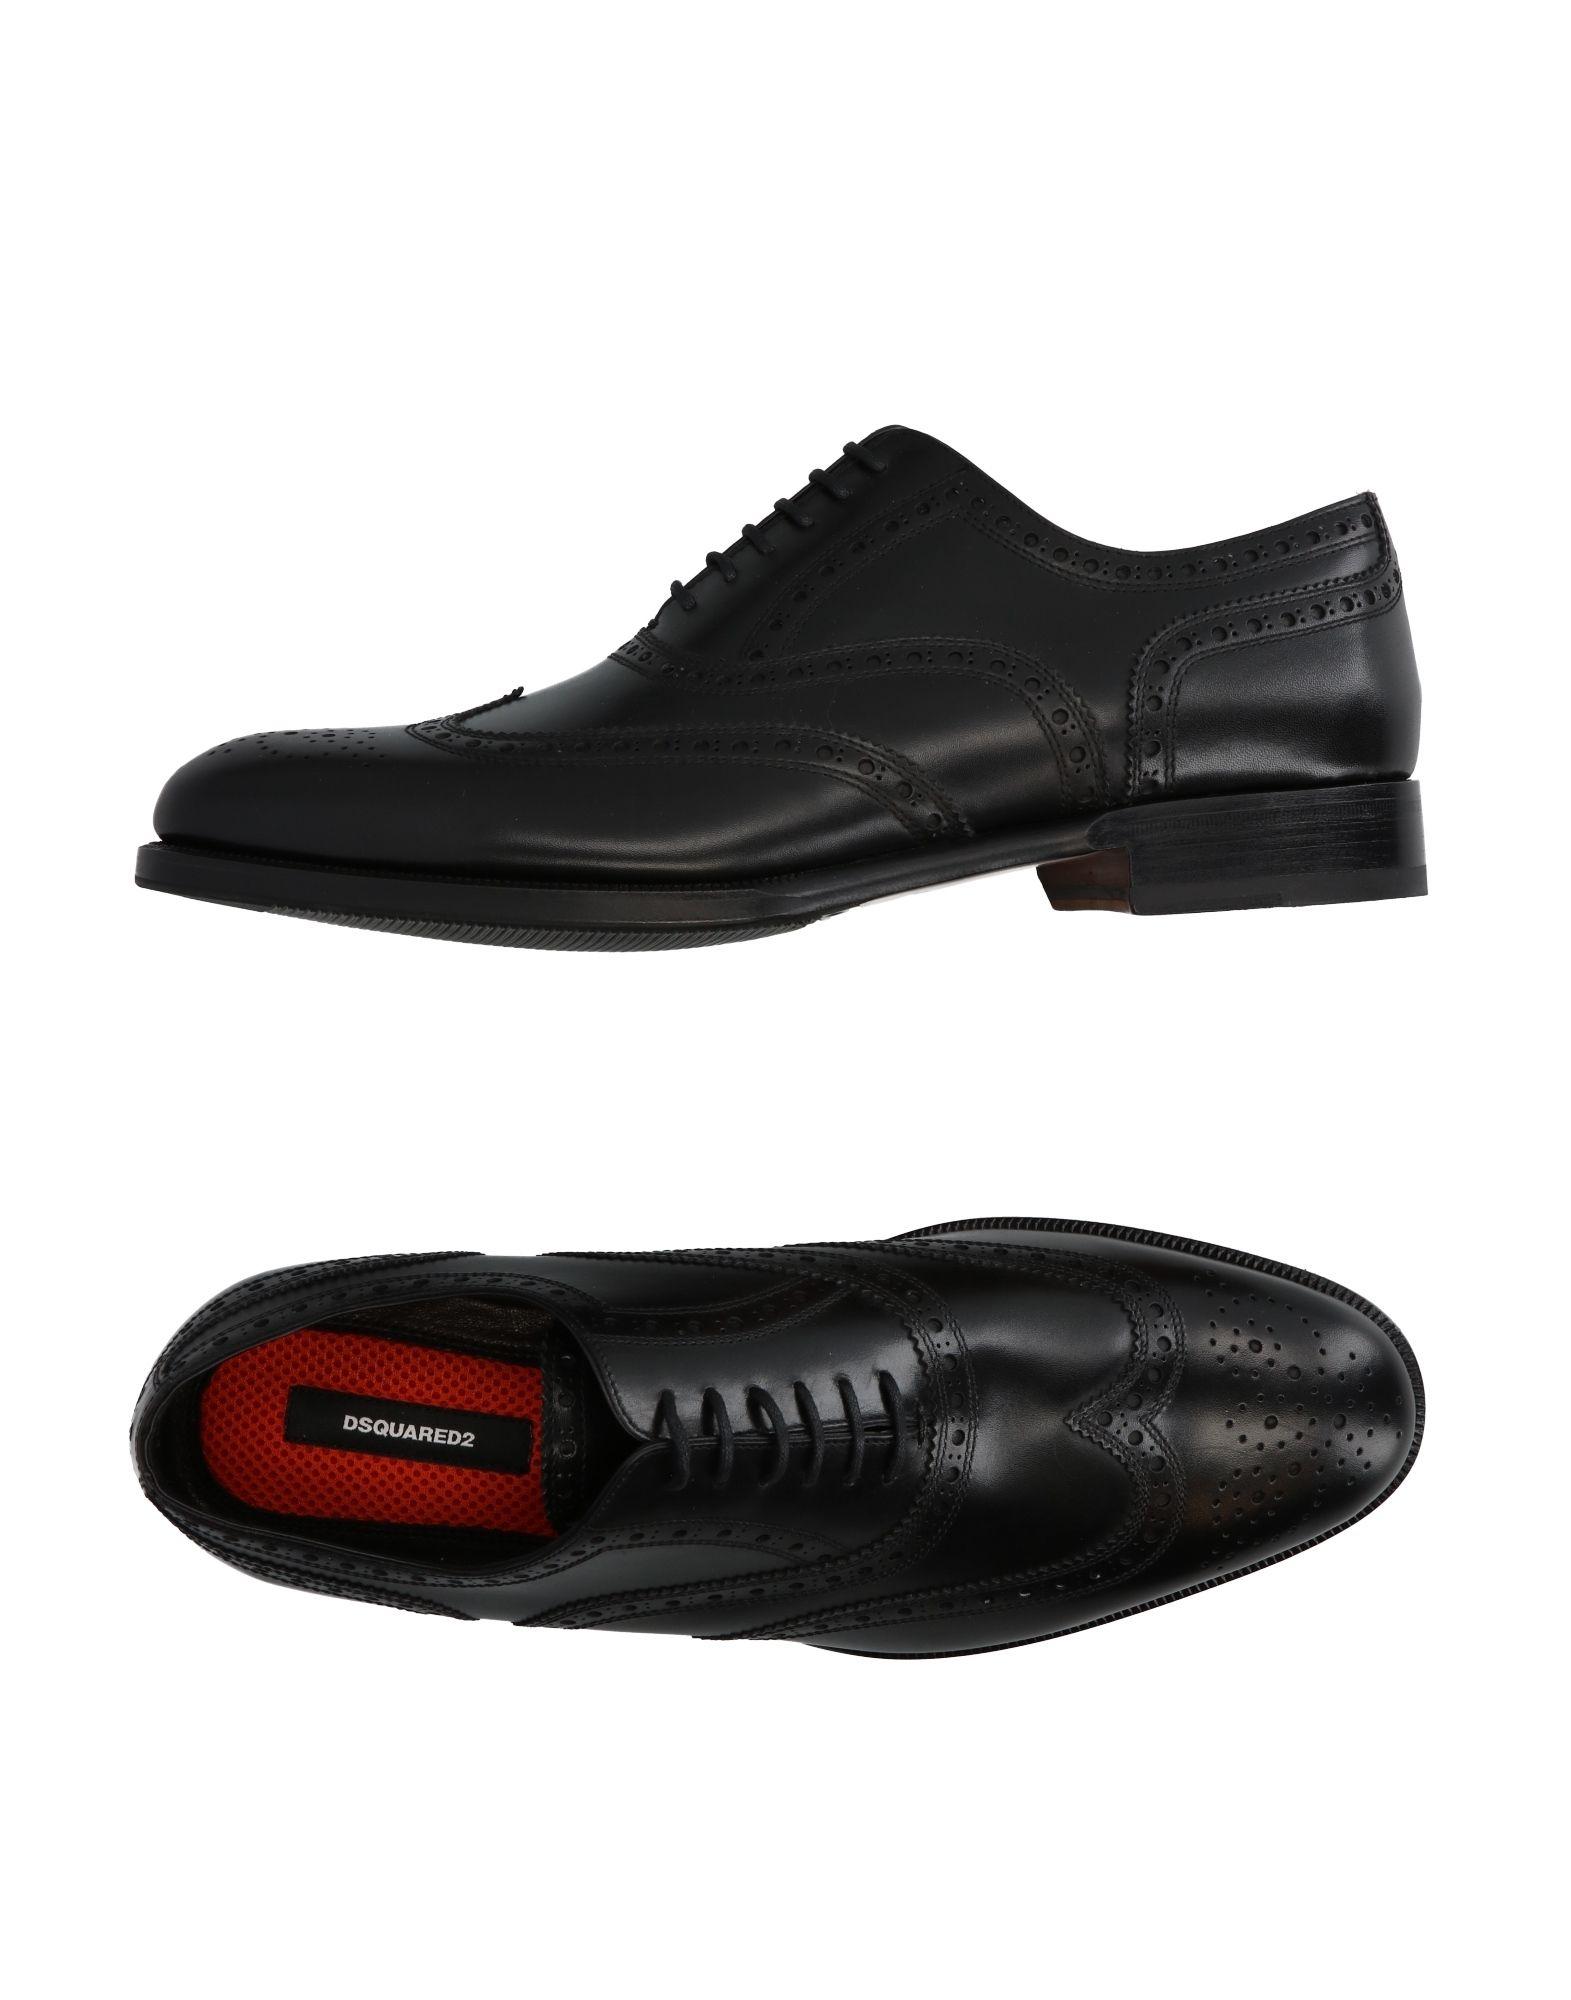 Dsquared2 Schnürschuhe Herren  11298712JK Gute Qualität beliebte Schuhe